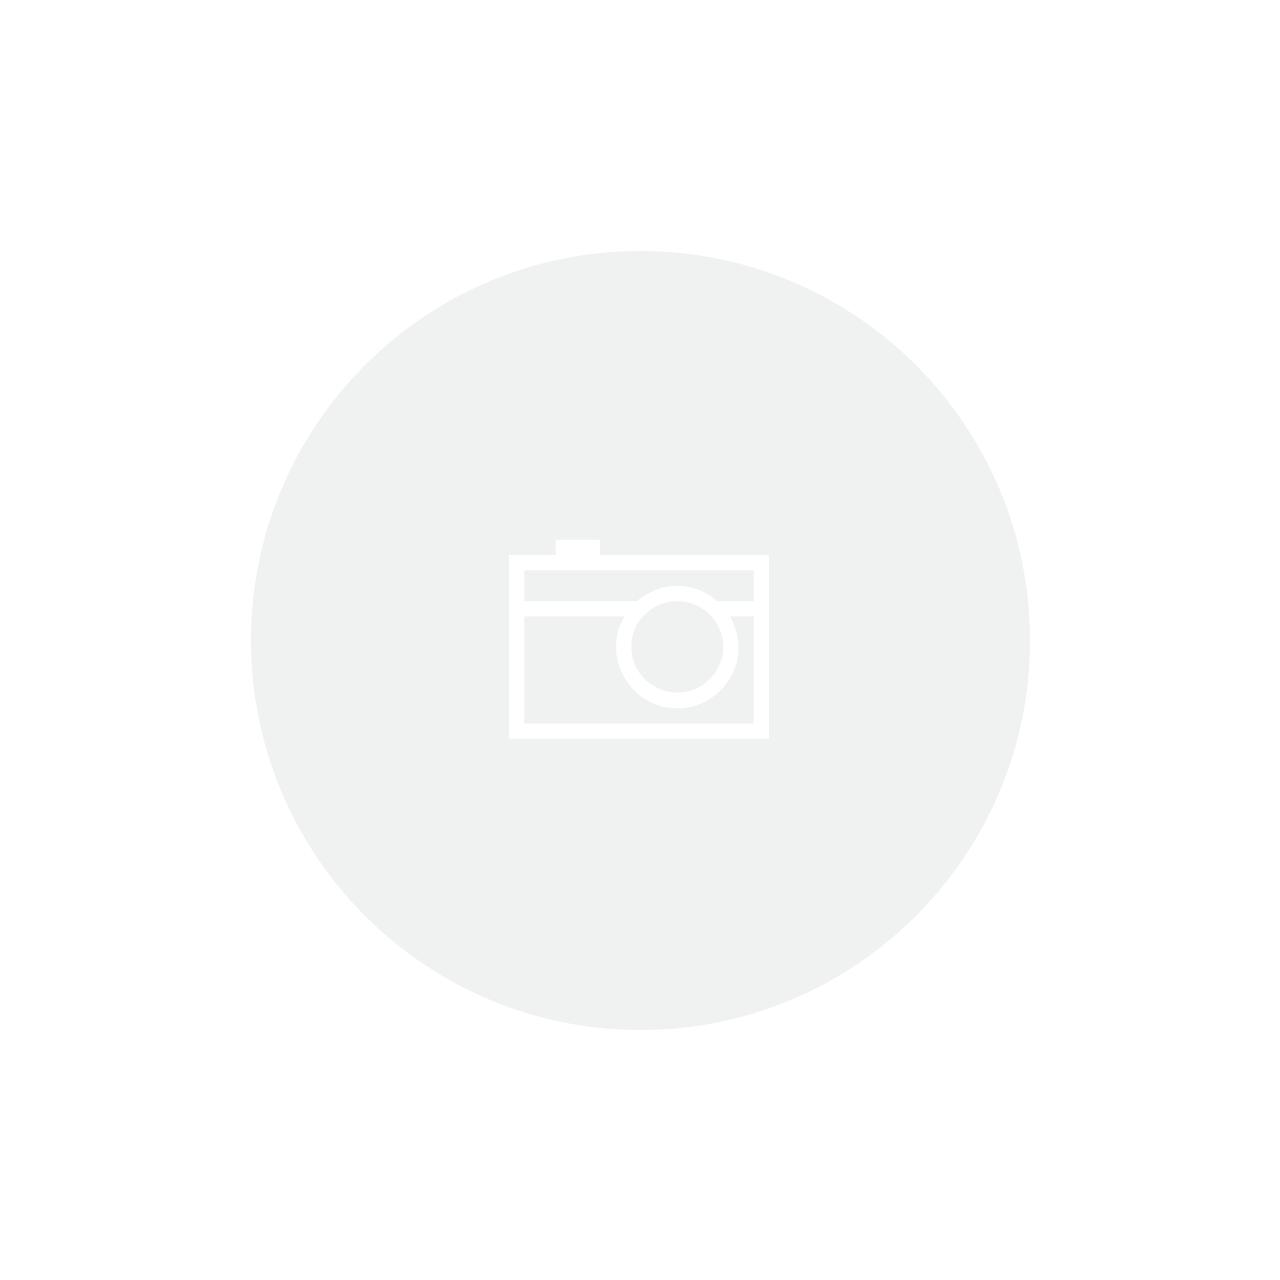 Papel Artesanal Indiano - Ref. 68